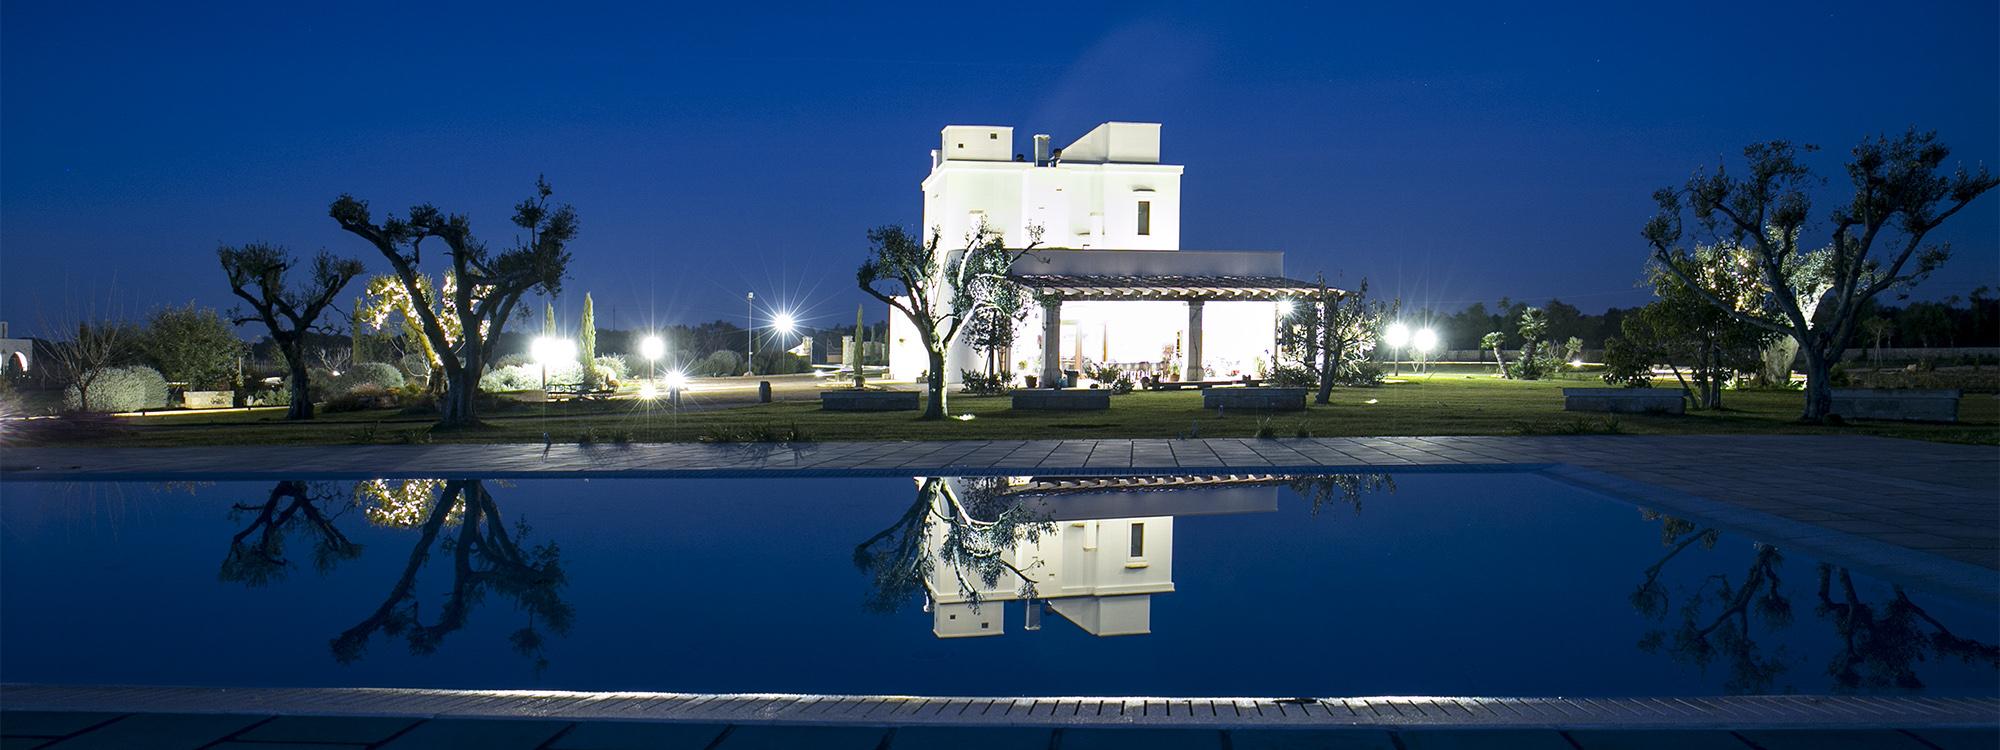 Tenuta Yala Residenza Agrituristica